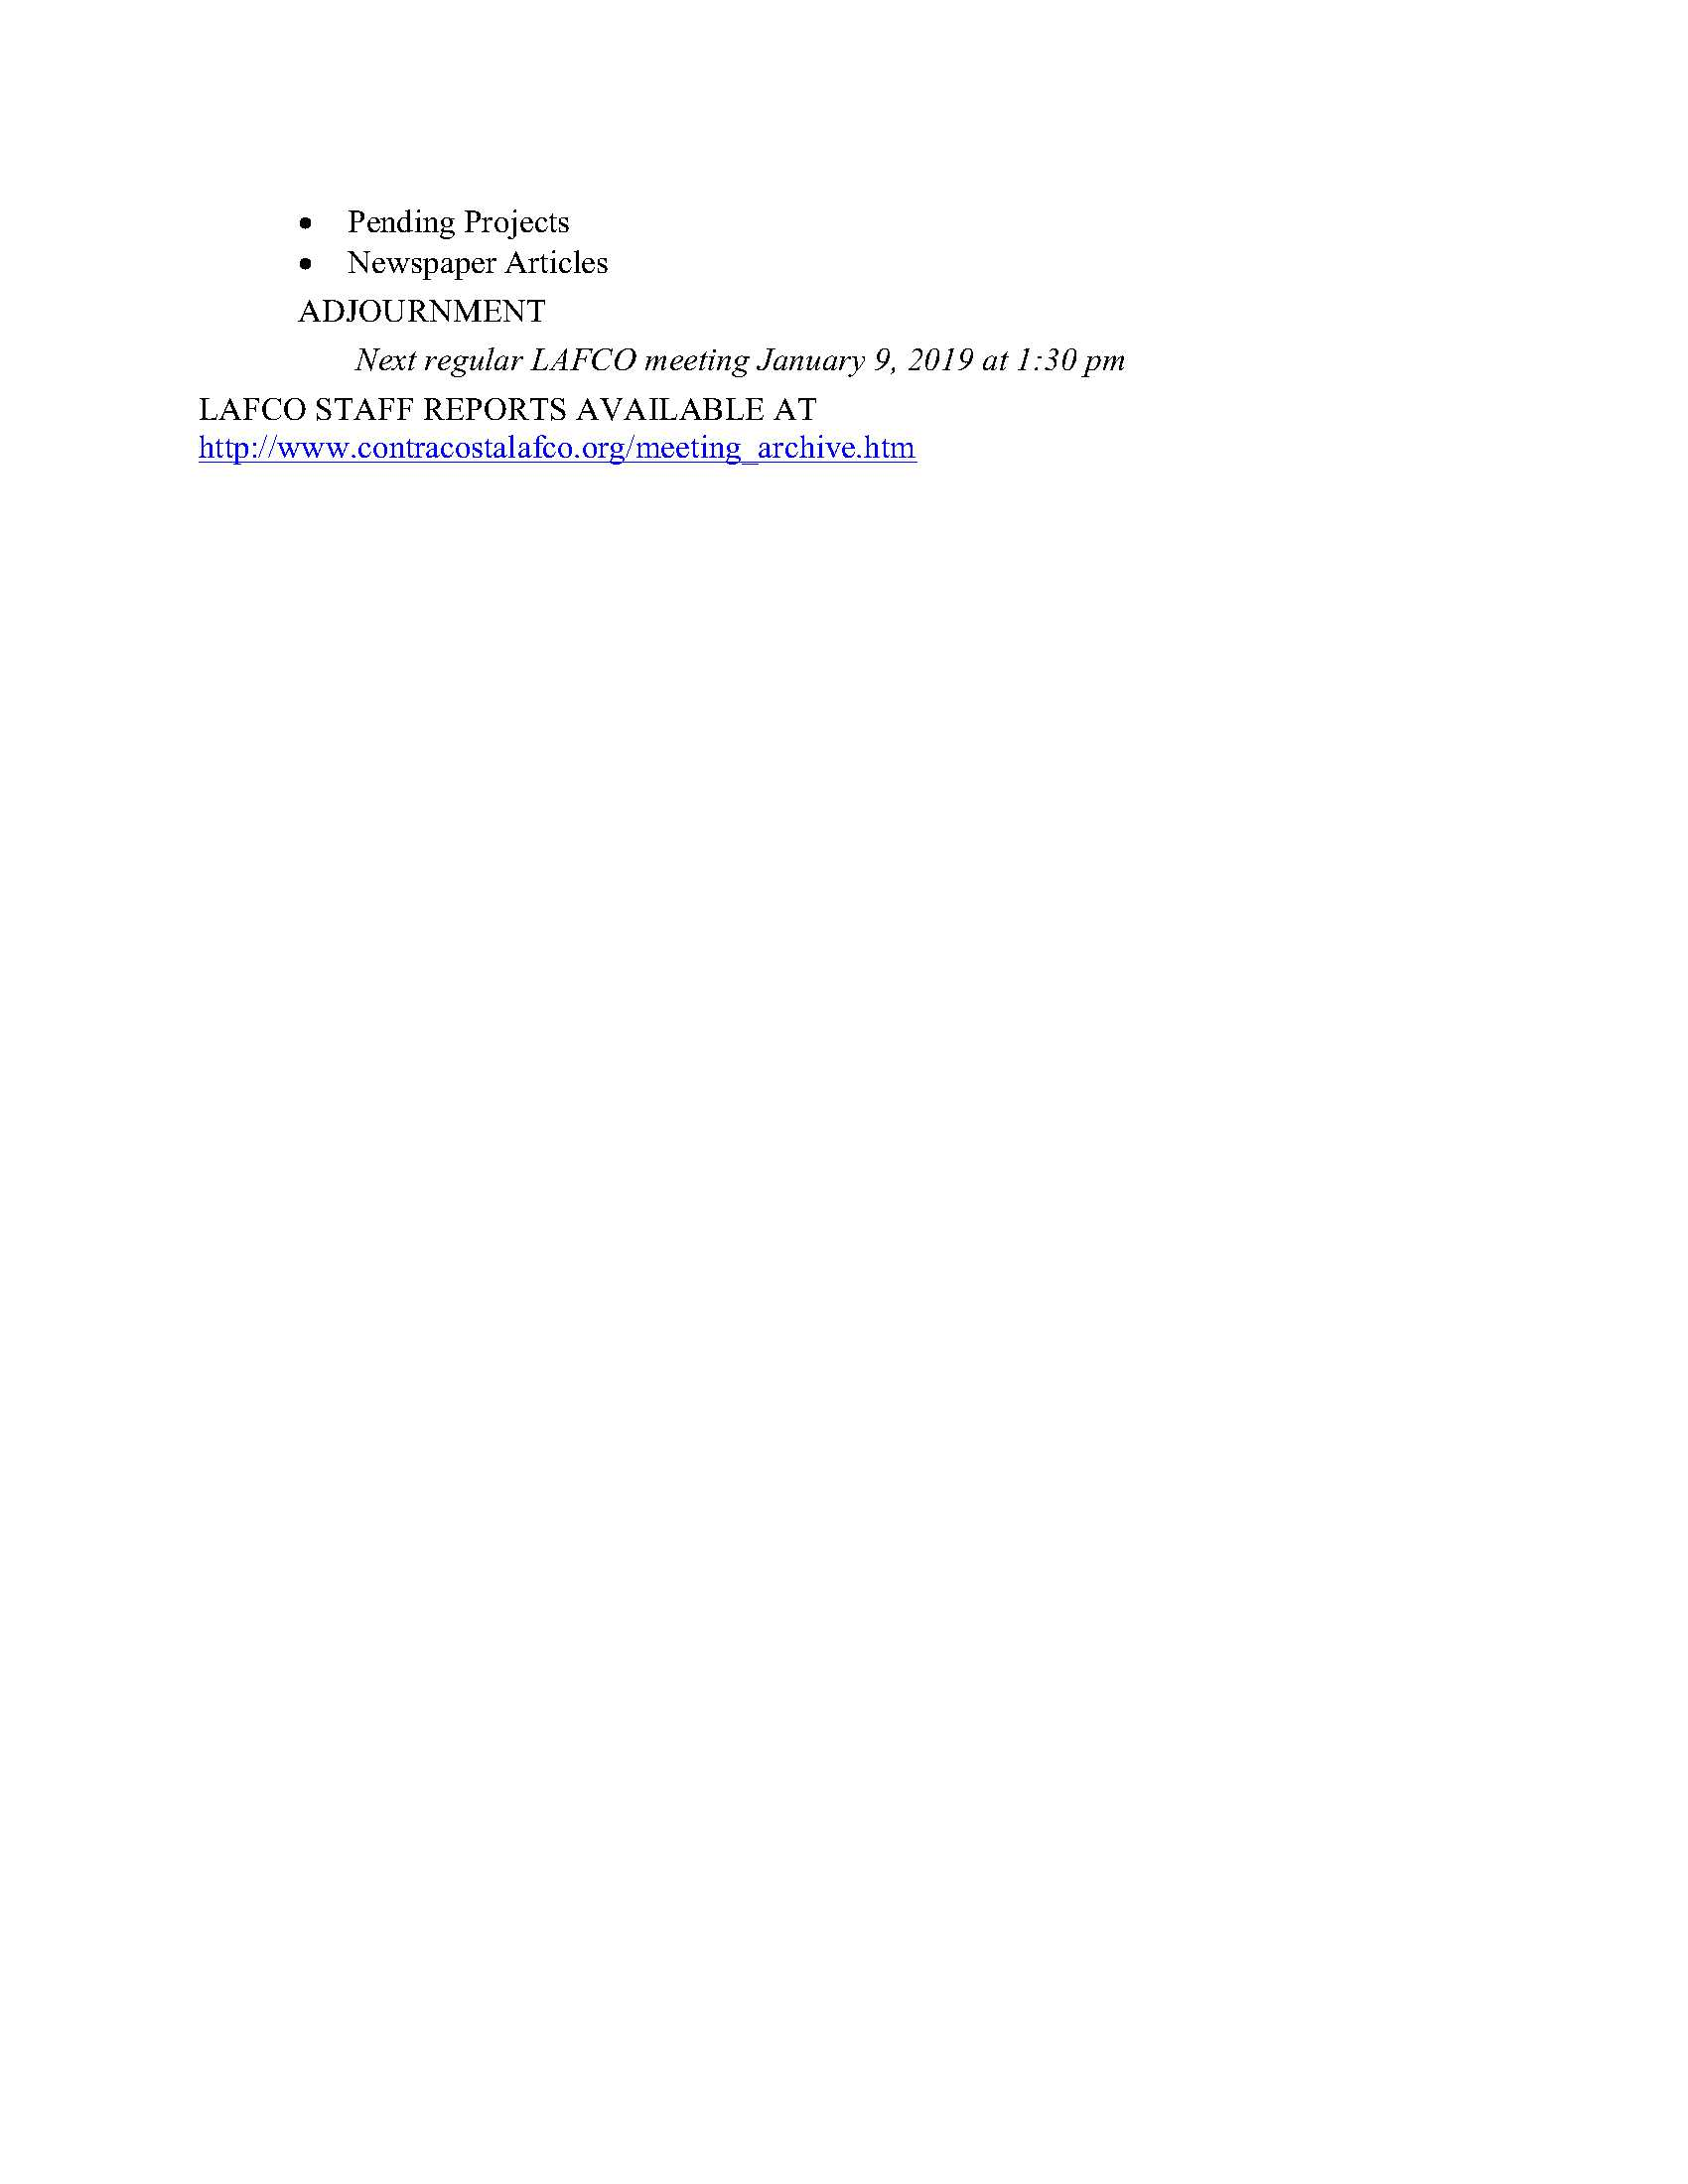 ESMAC Agenda 12.13.2018 (51 Pages)_28.jpg